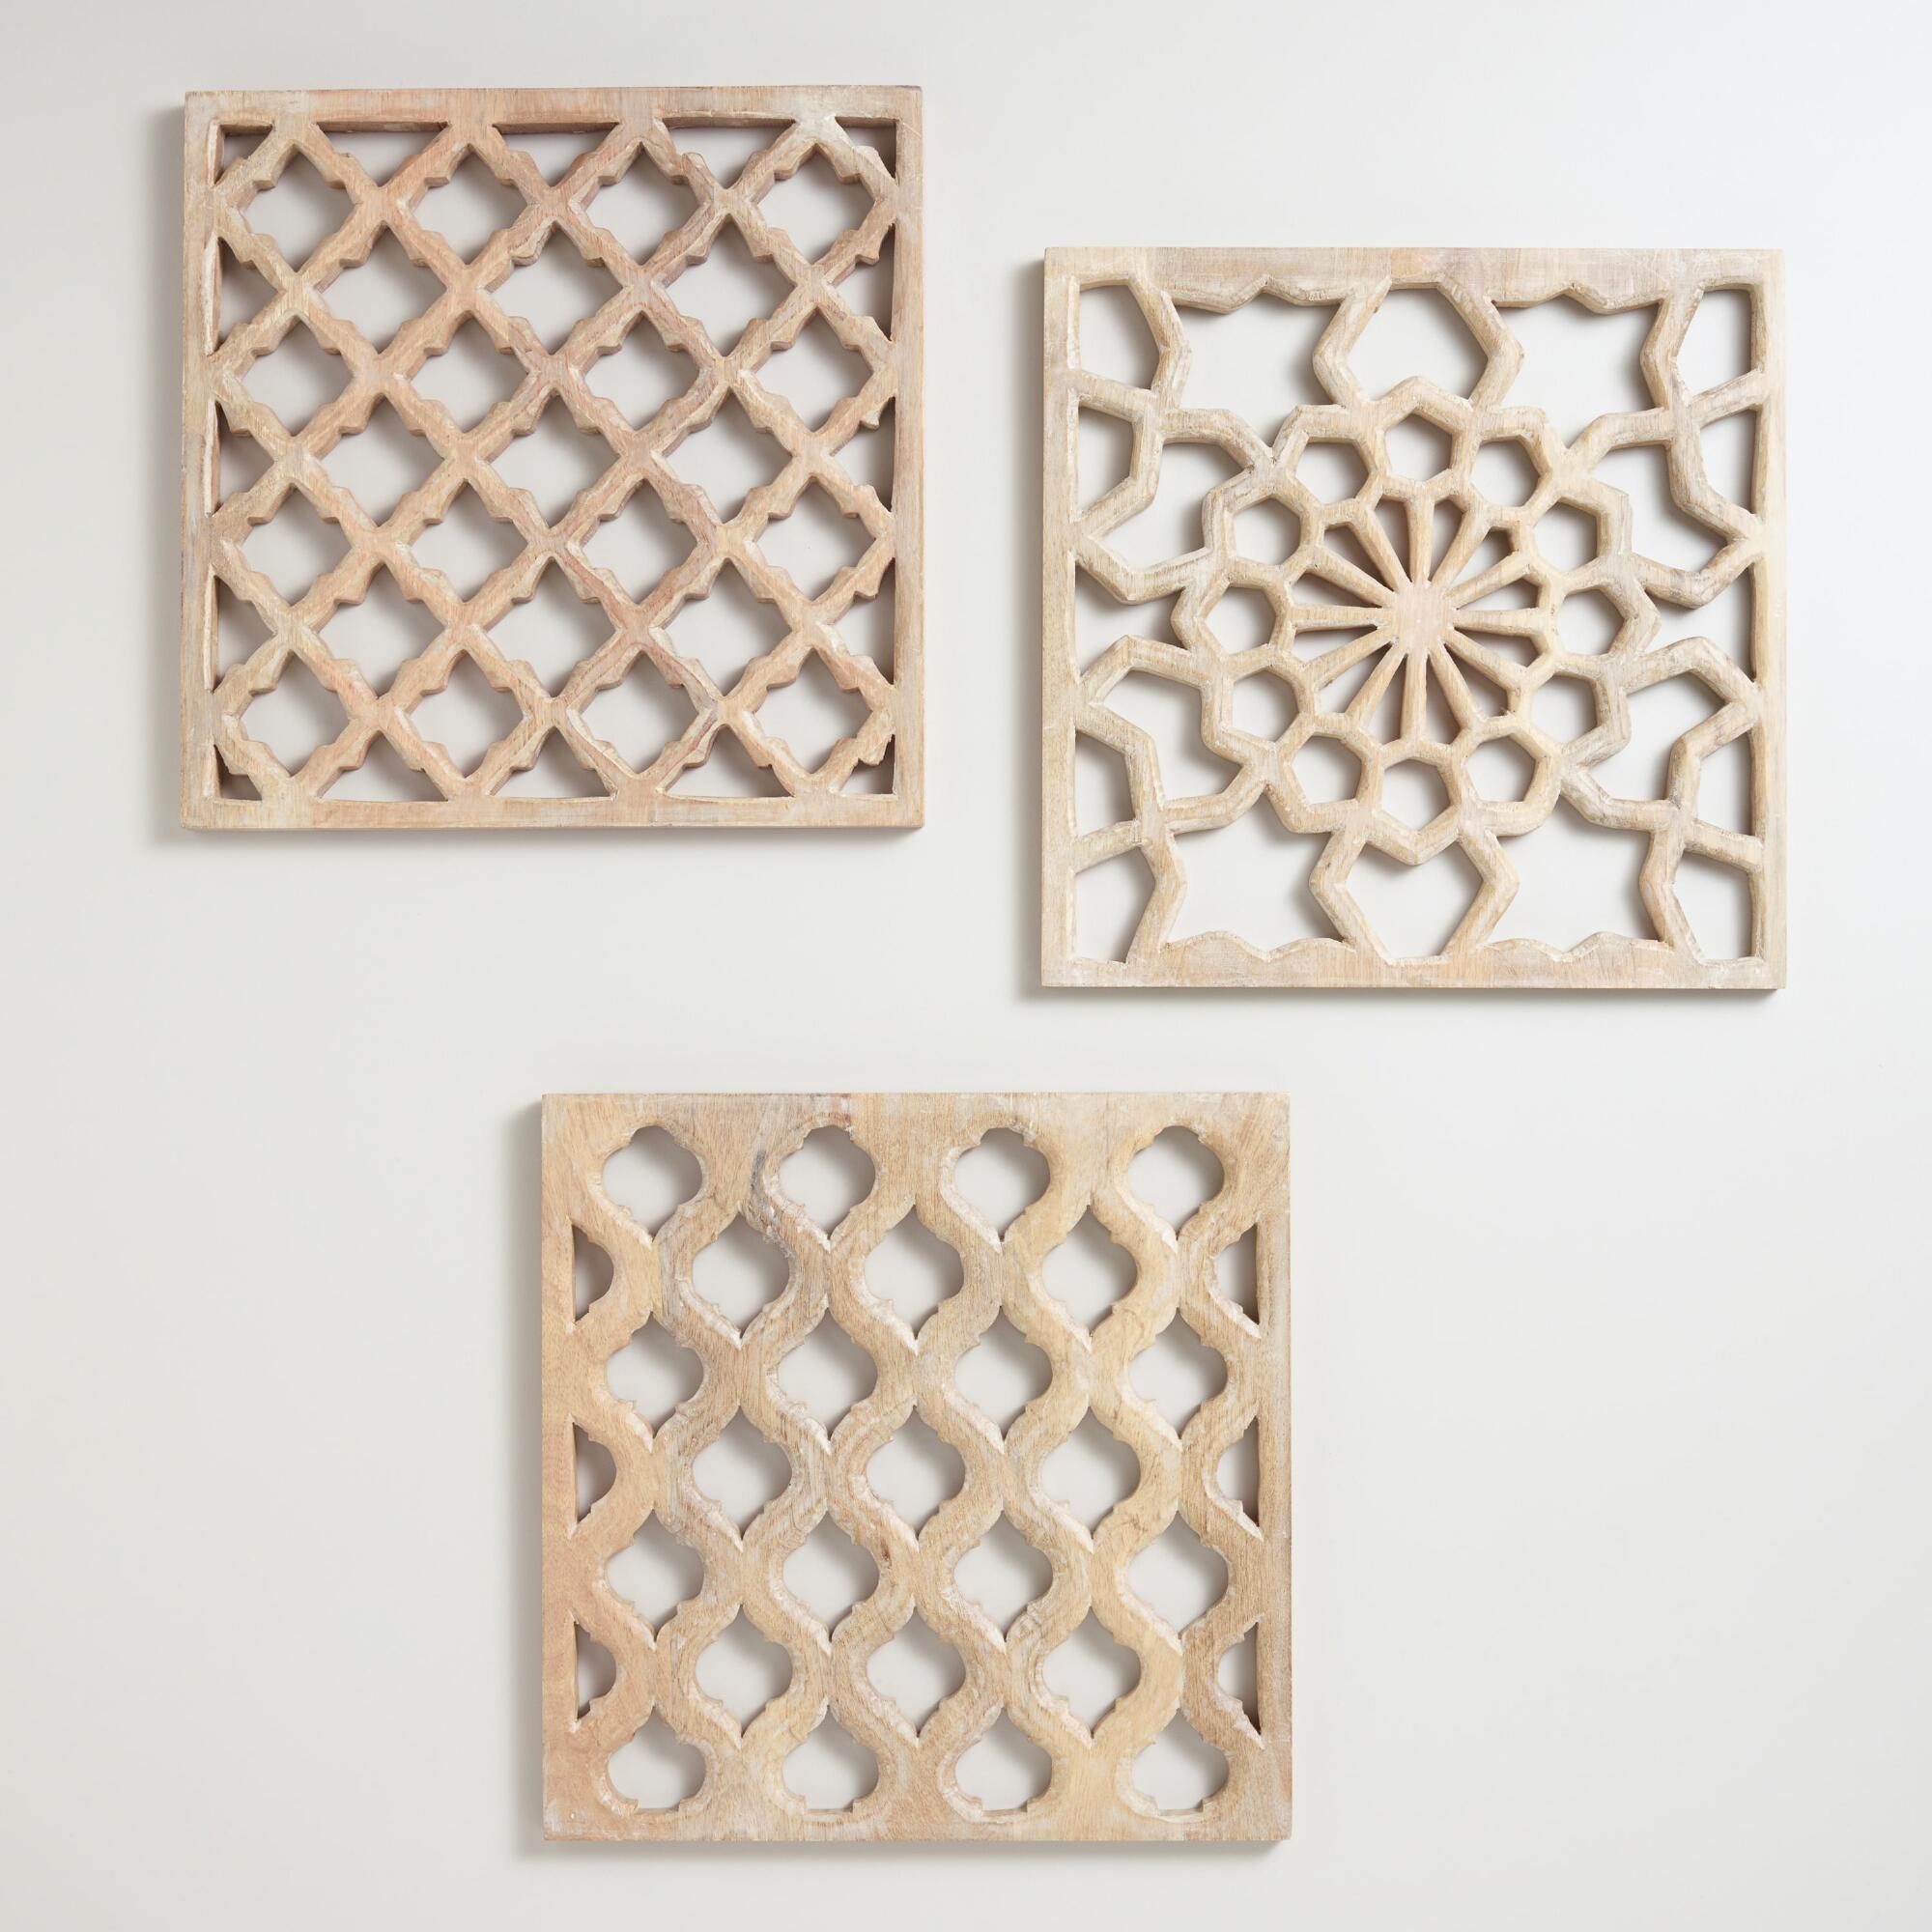 Nathan Carved Wood Wall Panels Set Of 3 World Market Regarding World Market Wall Art (Photo 7 of 20)